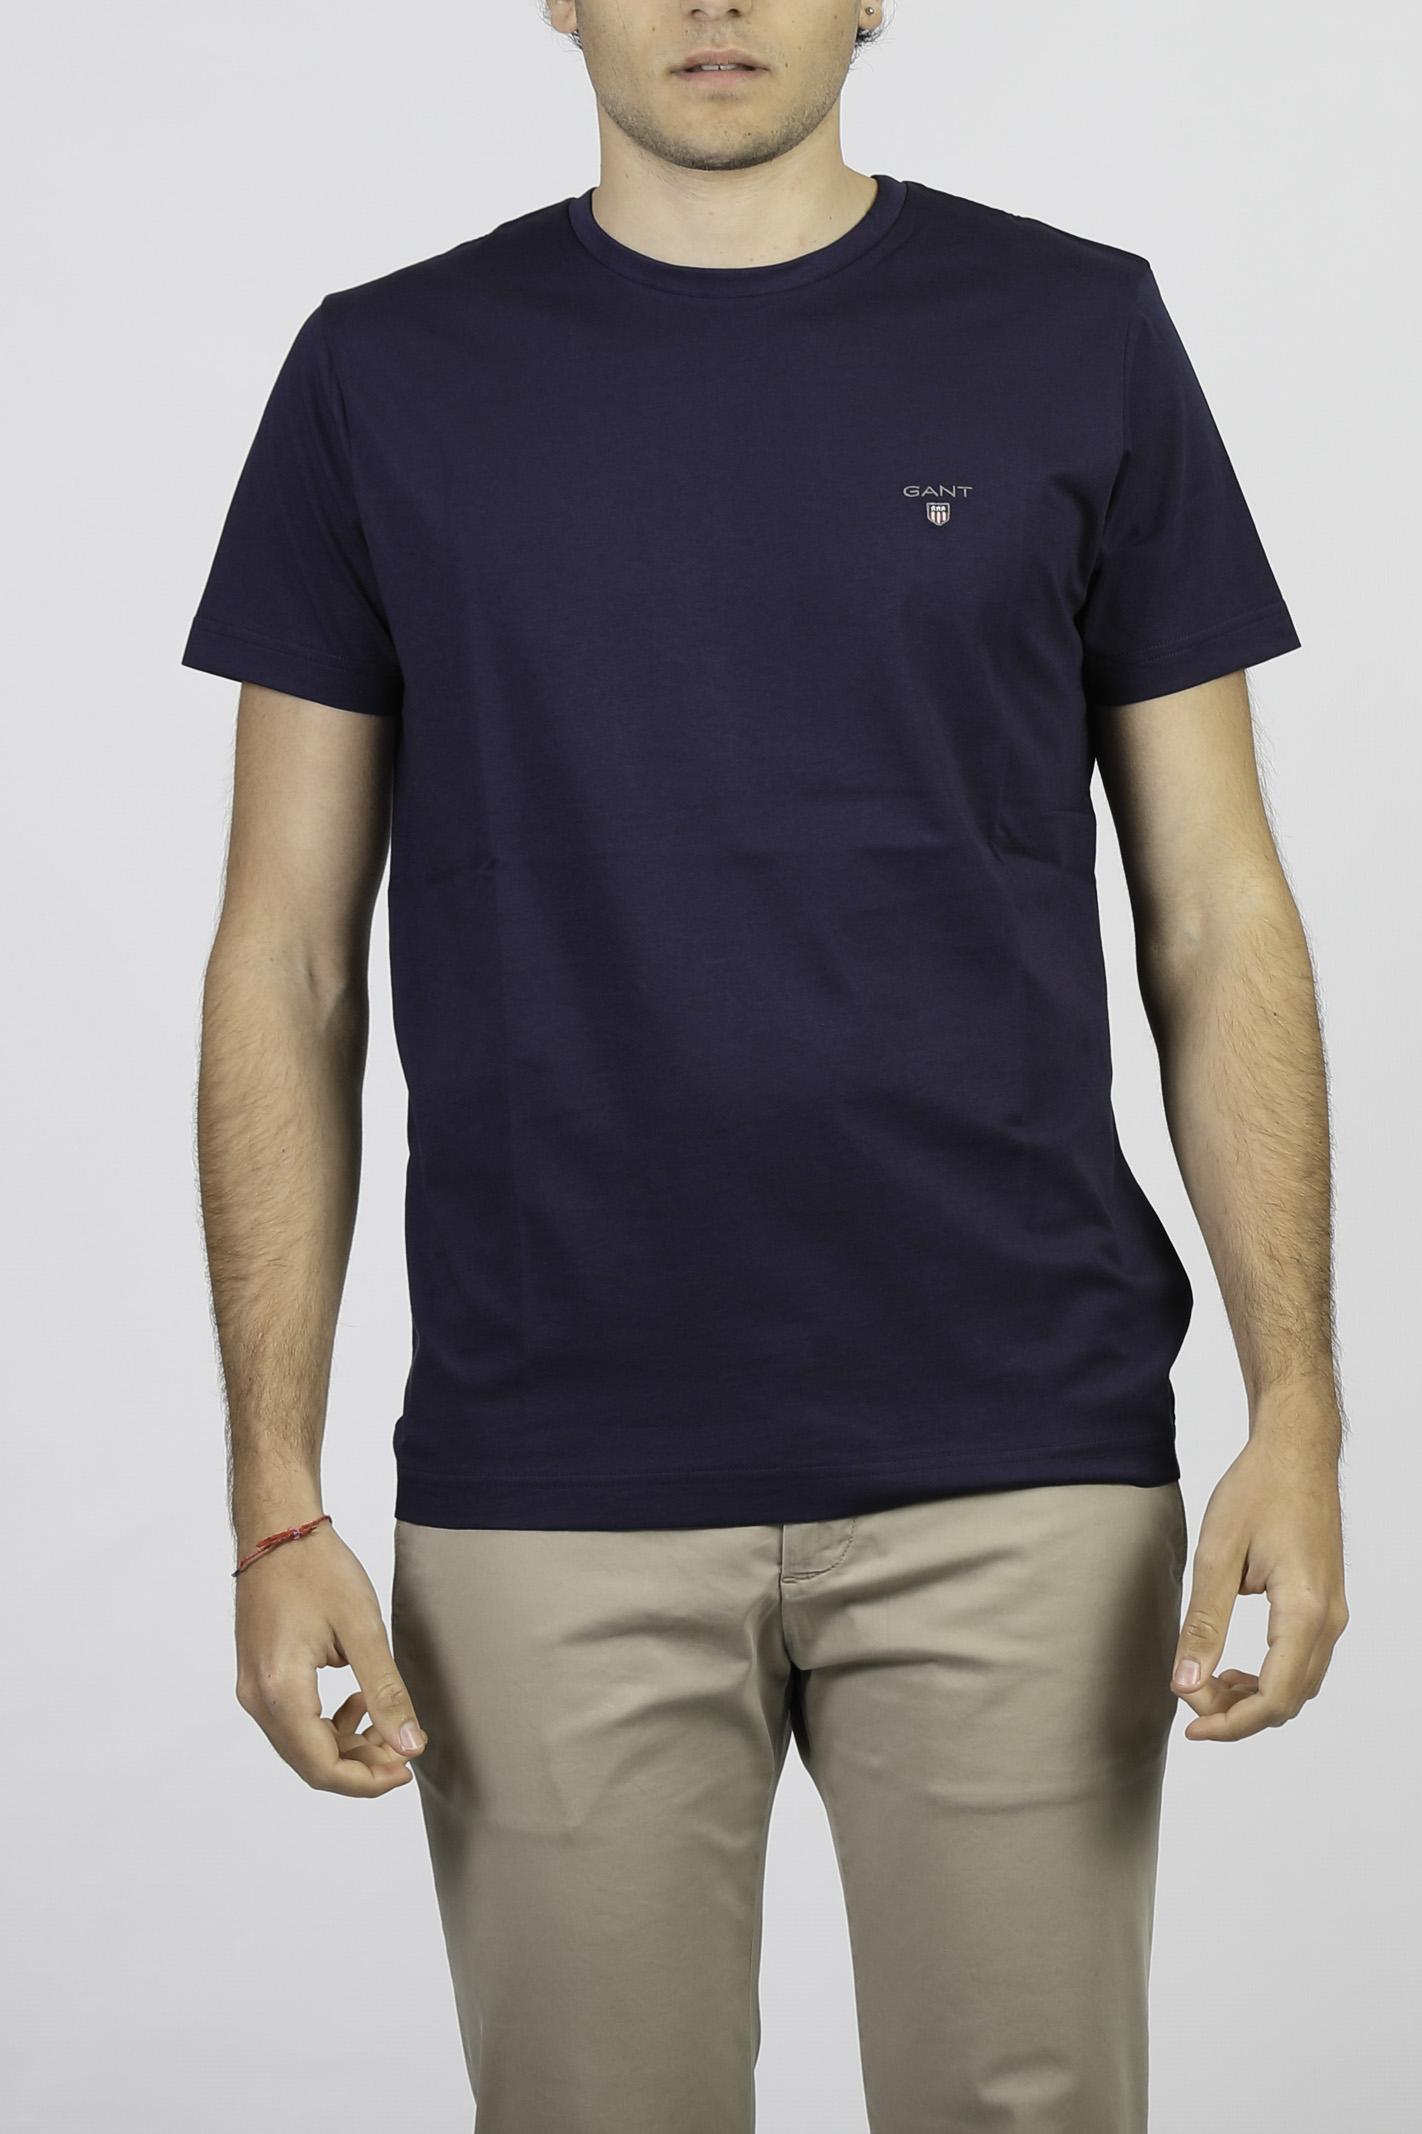 COTTON T-SHIRT GANT | T-shirt | 234100433